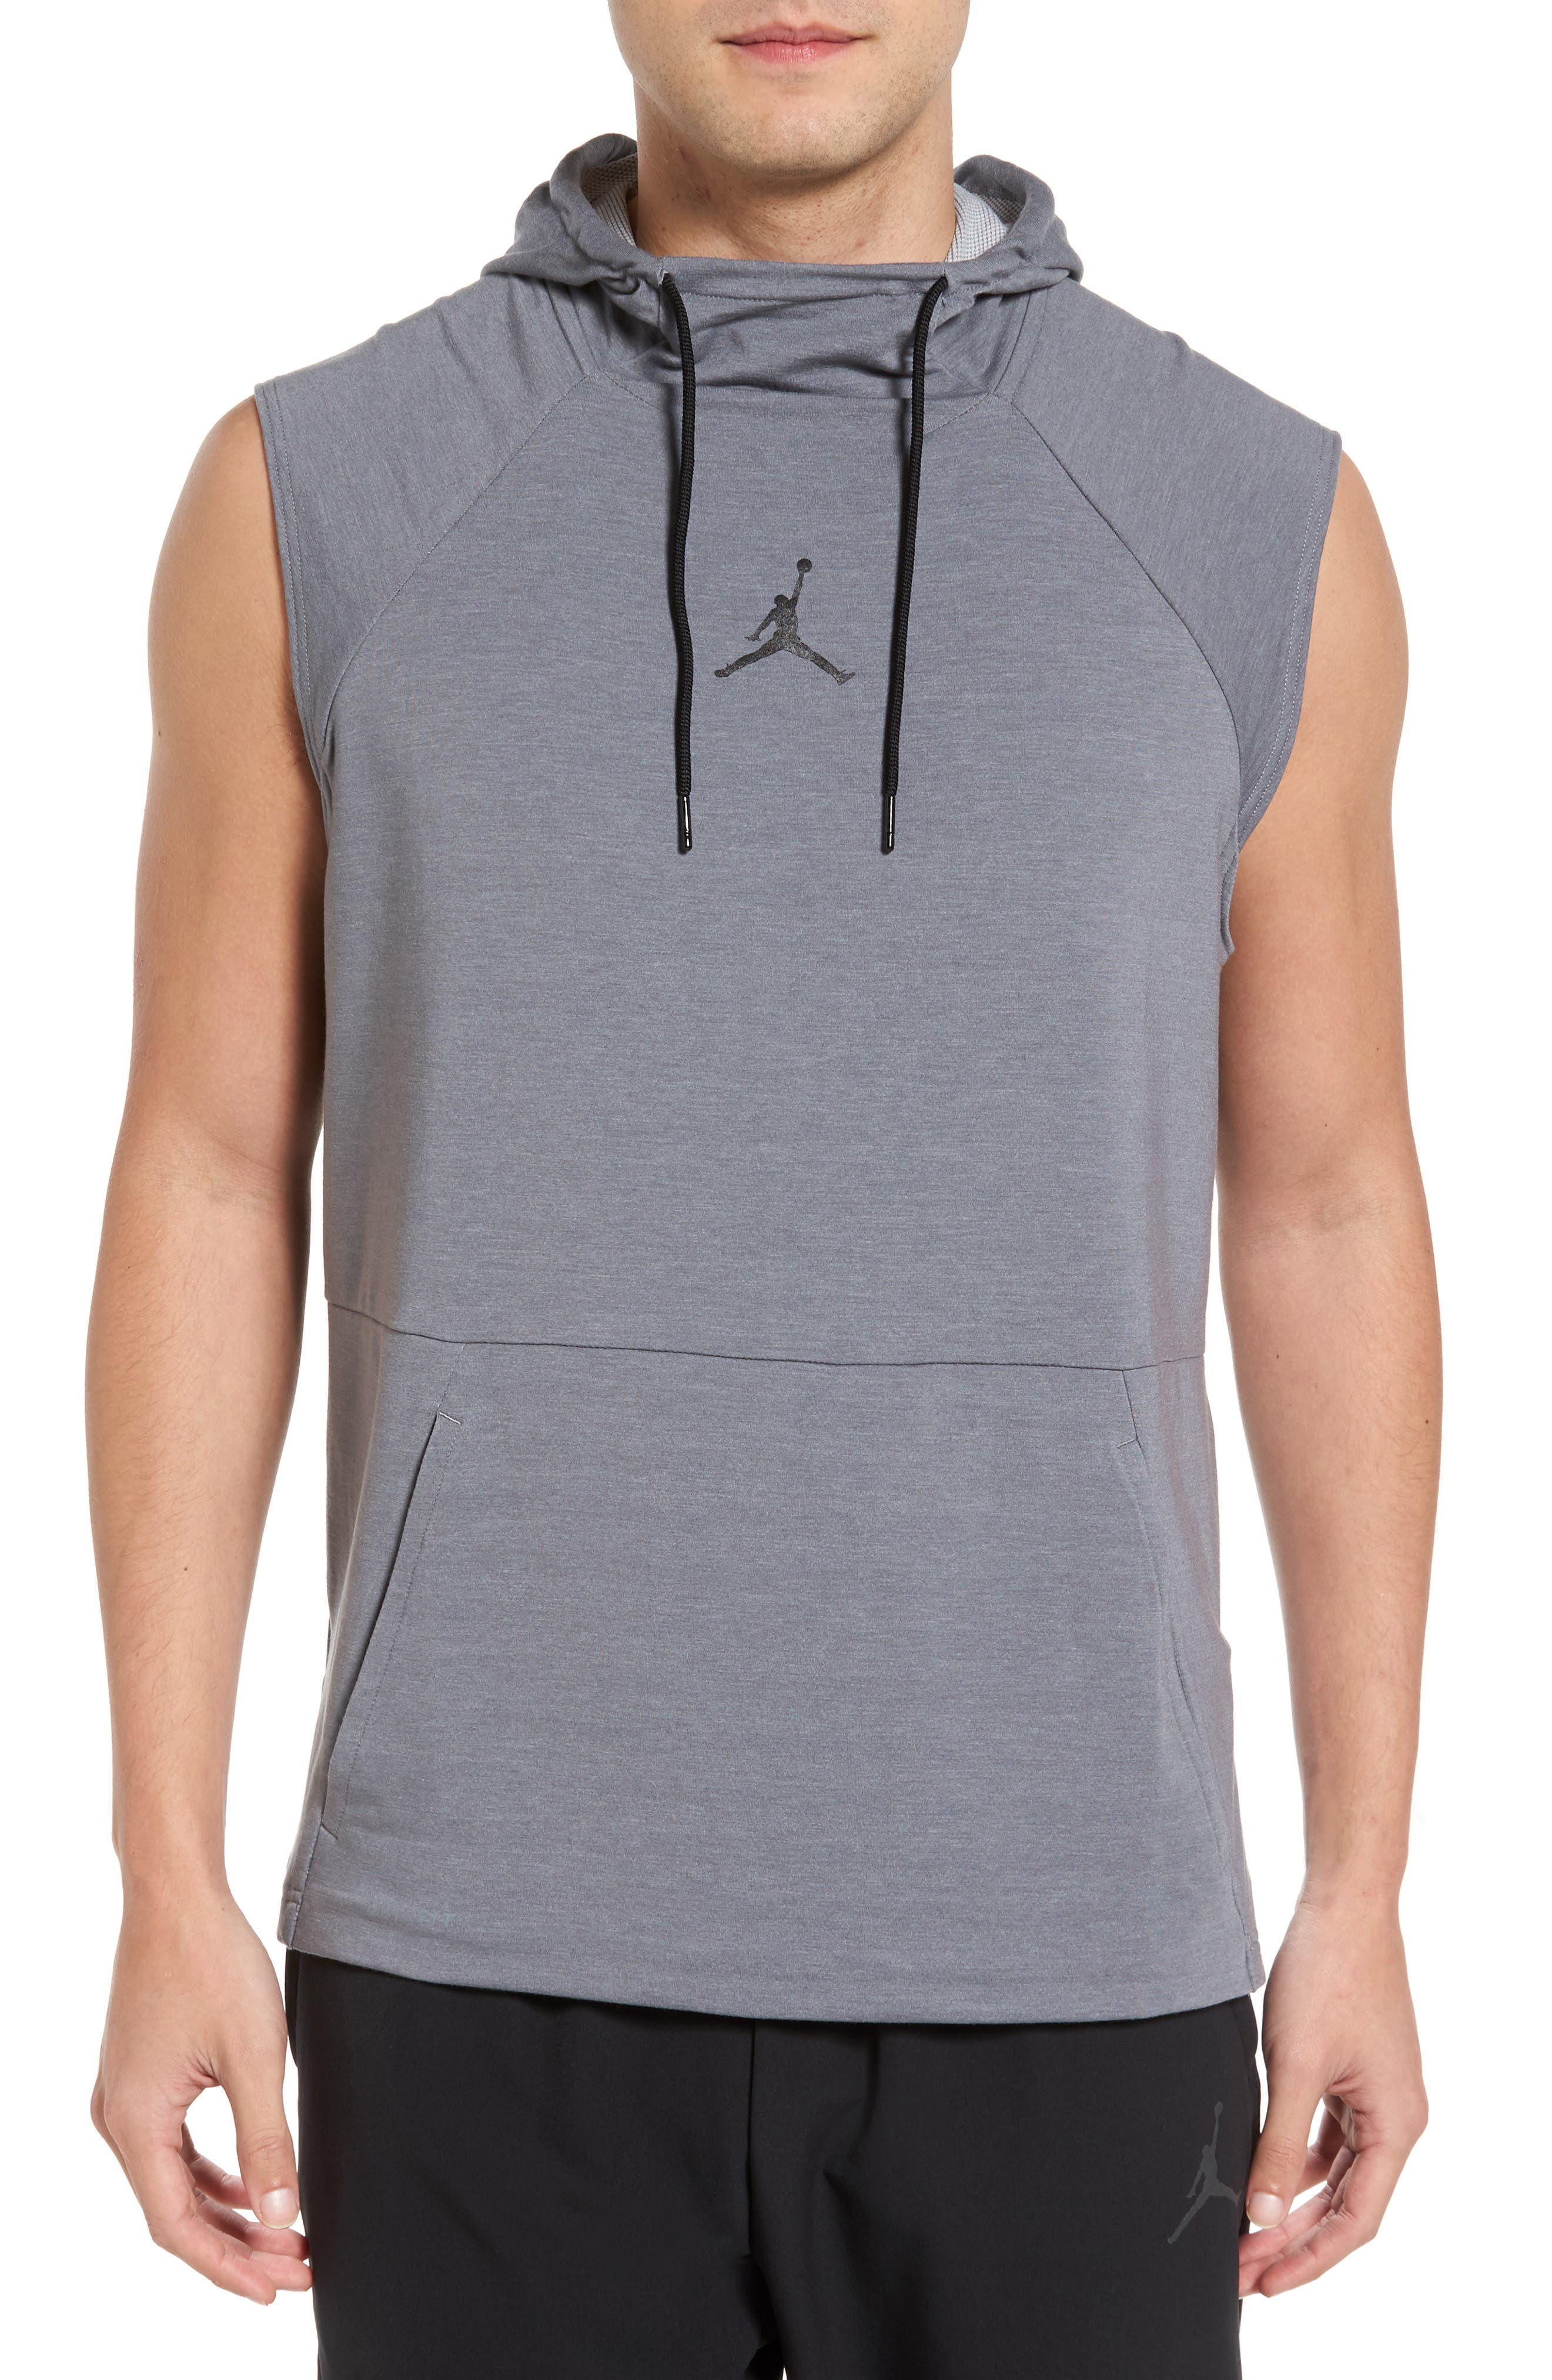 Main Image - Nike Jordan 23 Tech Sphere Sleeveless Training Hoodie